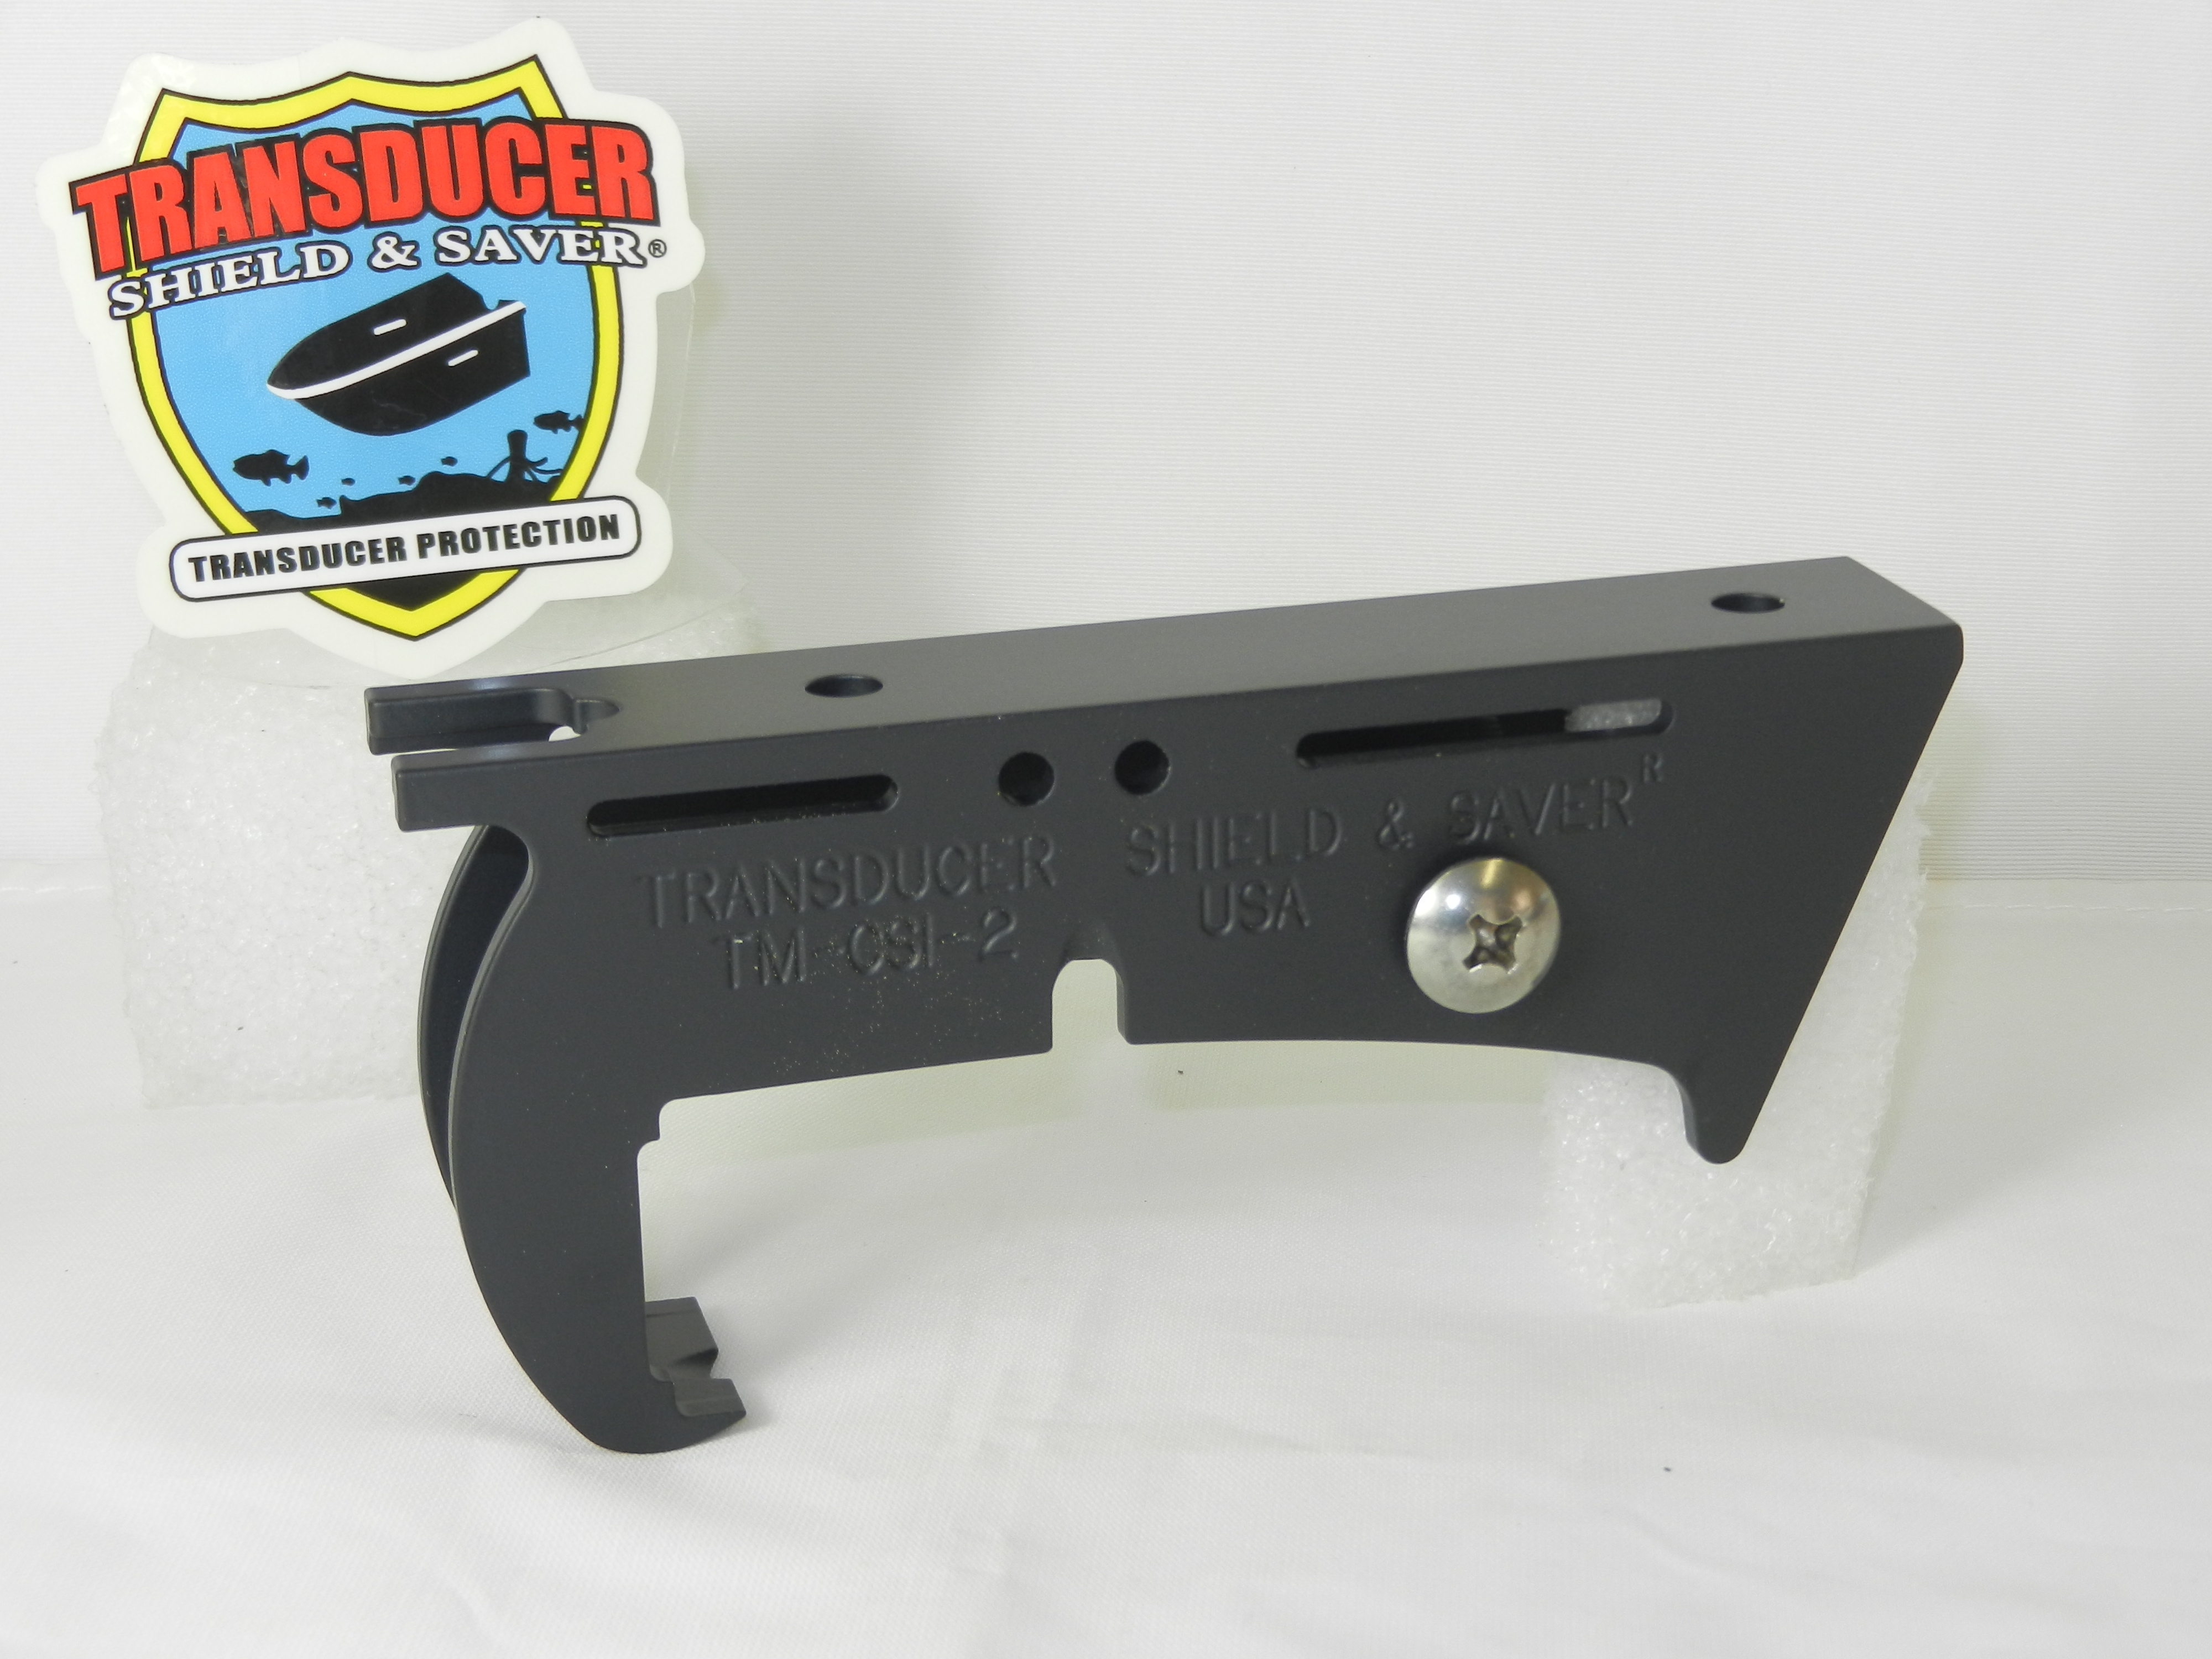 Transducer Shield And Saver Tm Csi 2 Fits Humminbird Side